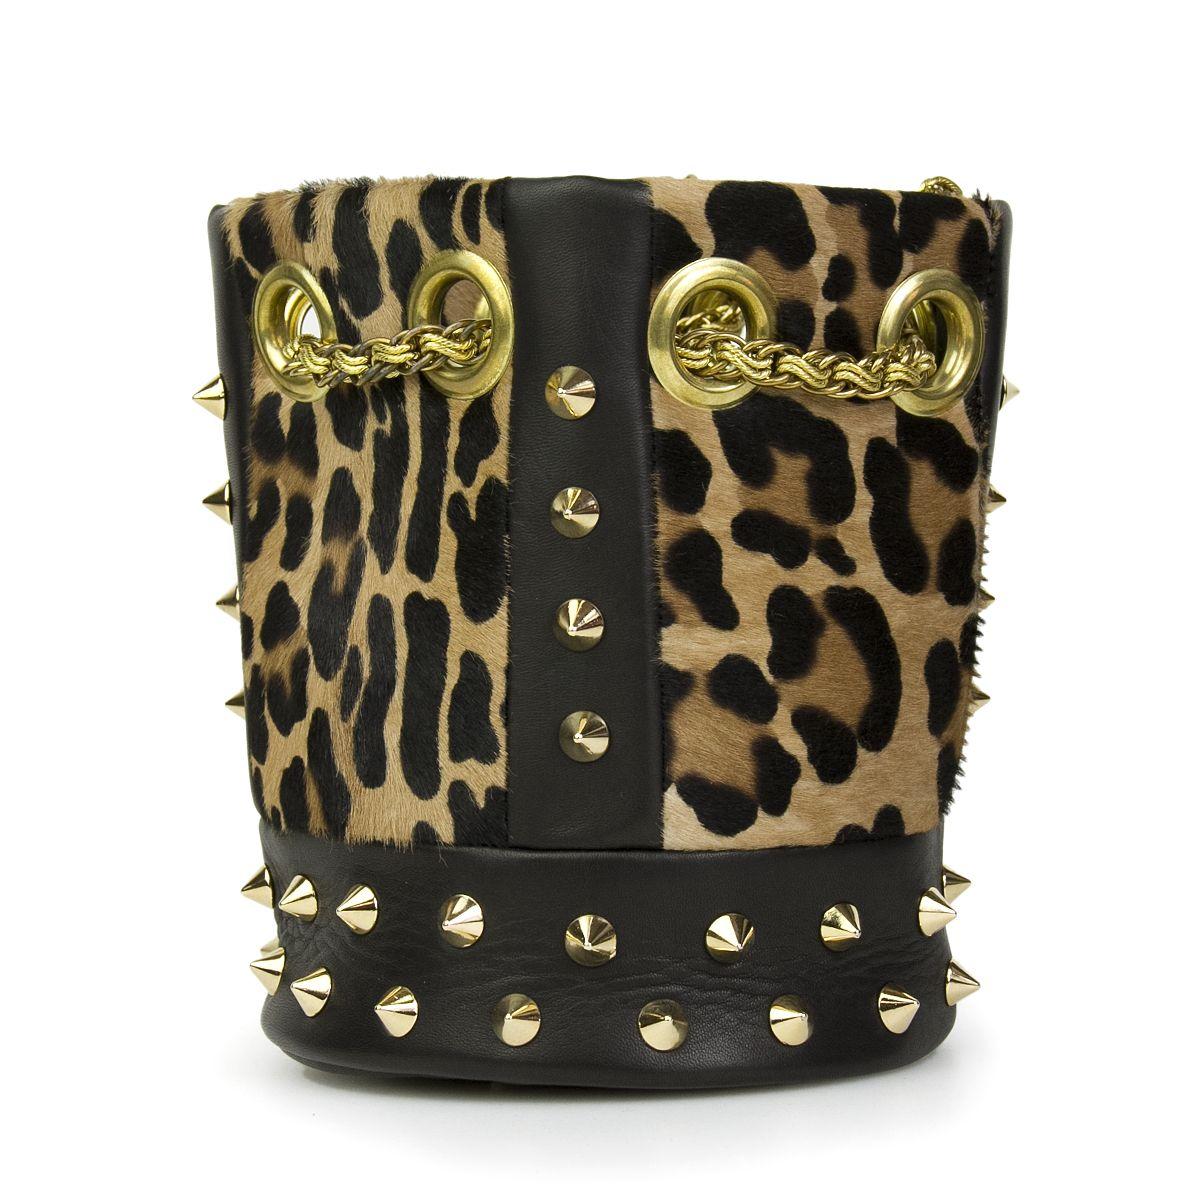 - Delphine Delafon cavallino leopardskin studded sac